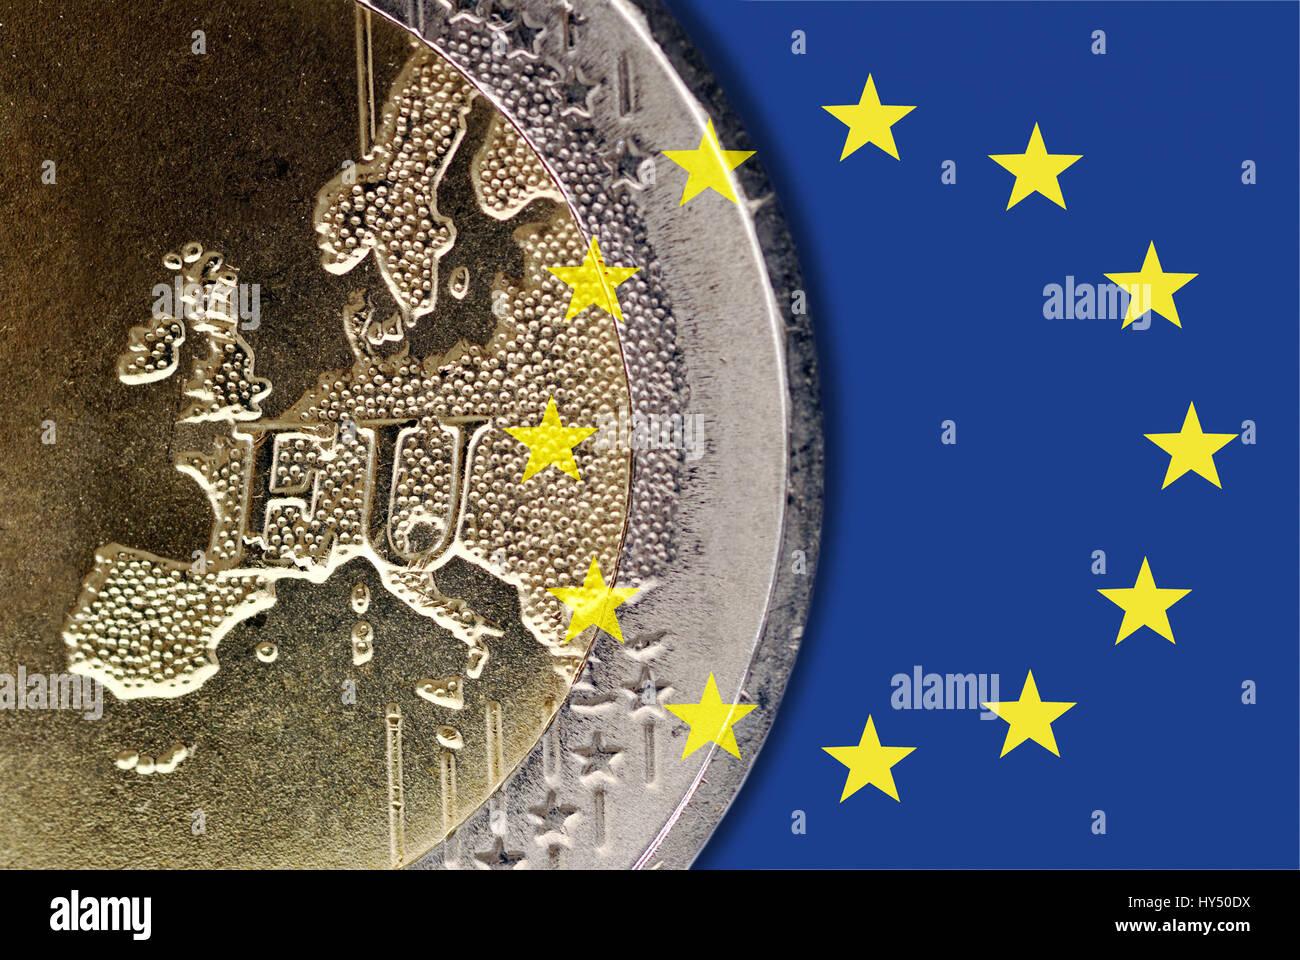 EU flag and euro-coin, European monetary fund, EU-Fahne und Euro-Muenze, europaeischer Waehrungsfonds - Stock Image